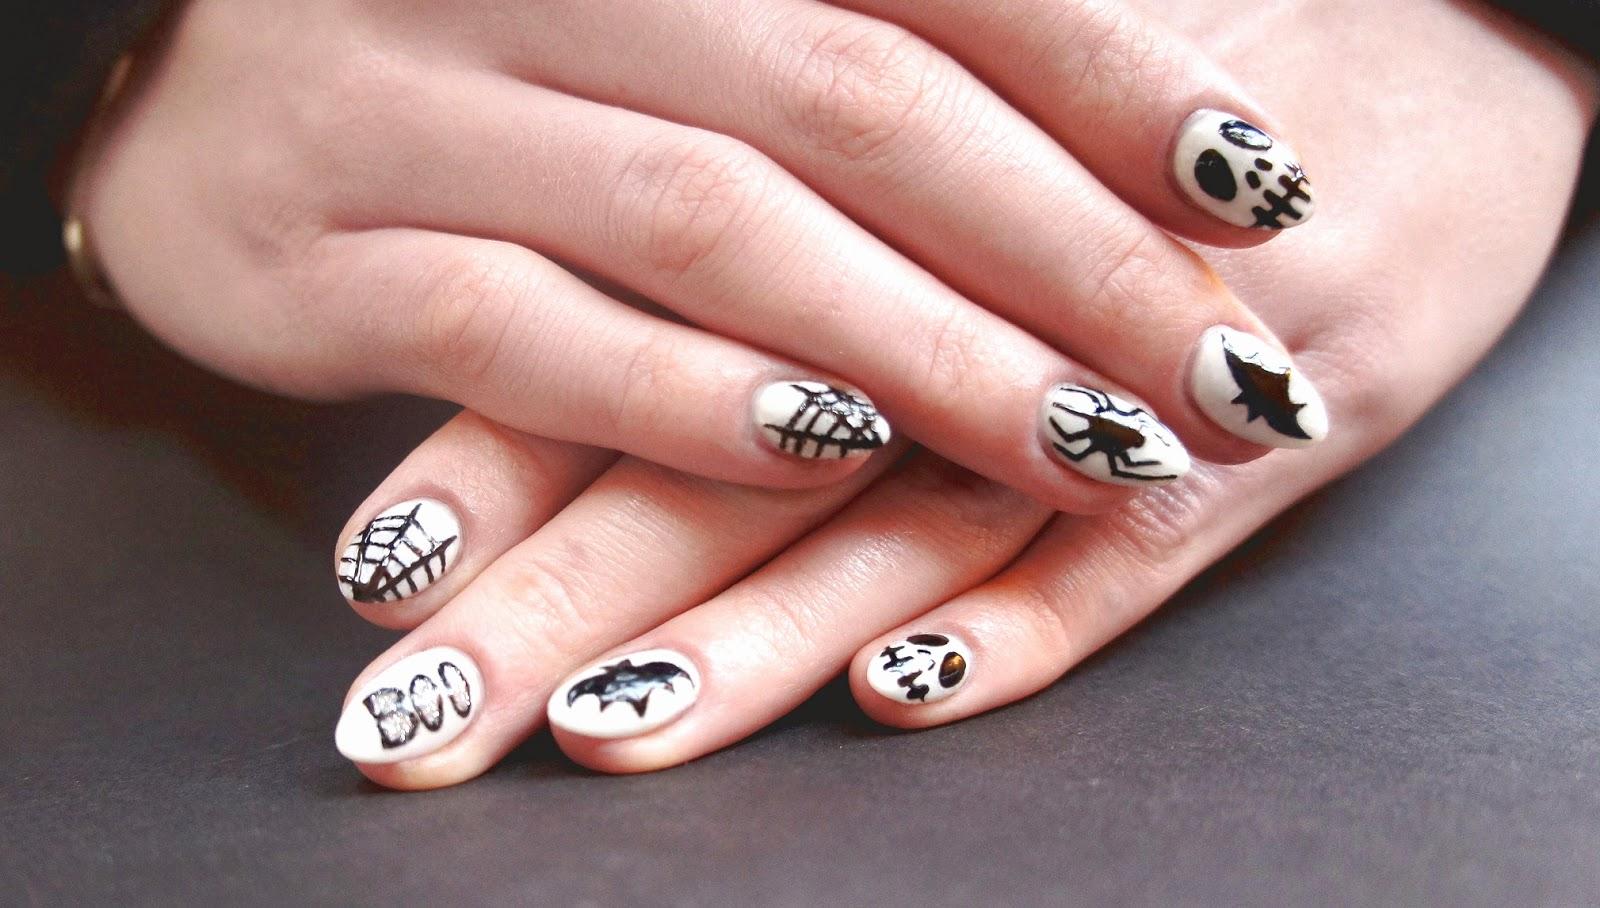 paznokcie halloweenowe